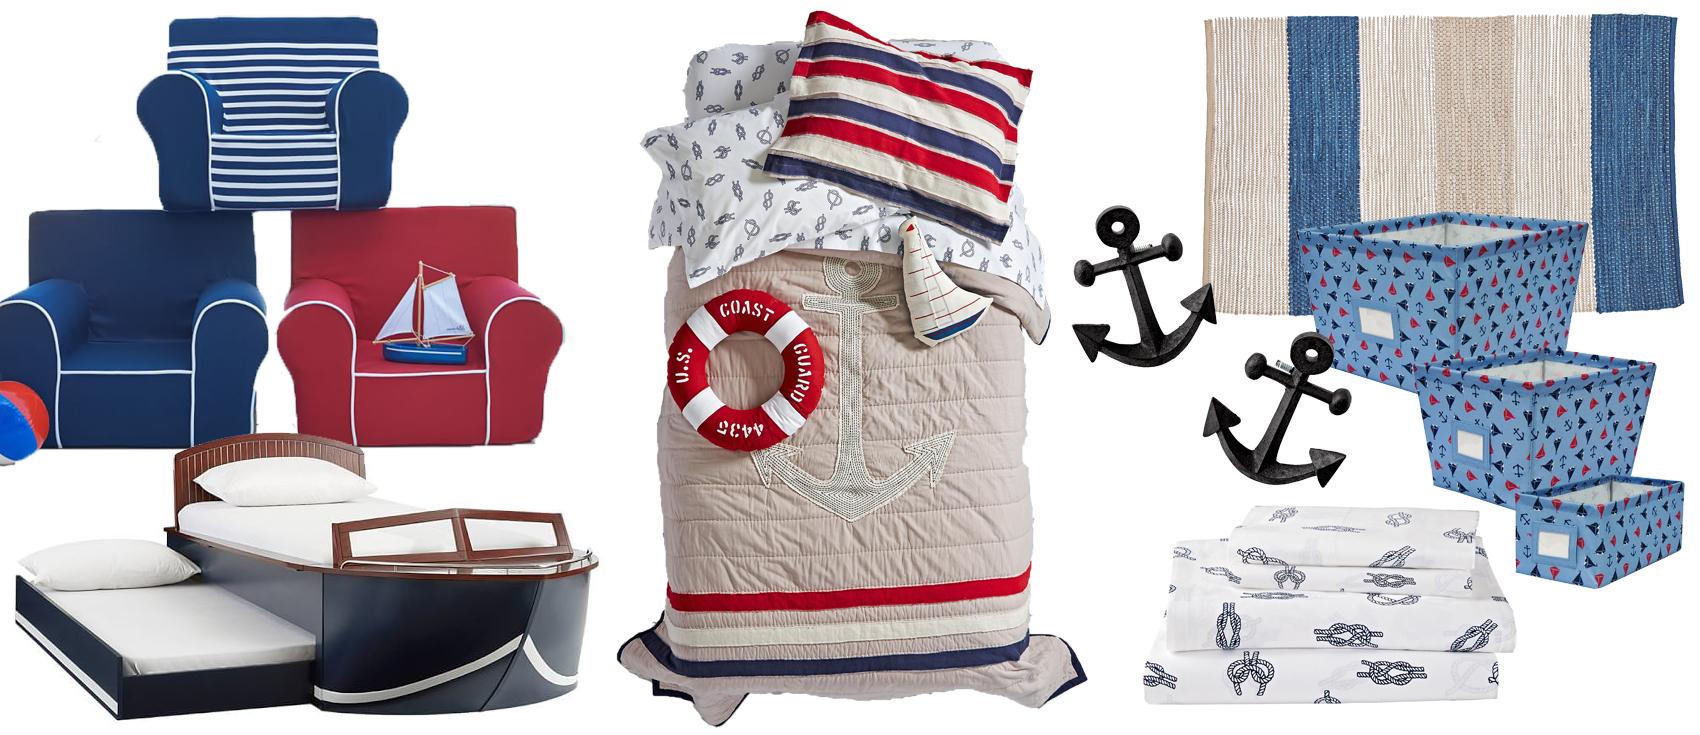 Nautical Bedroom Decor Kids kids nautical bedroom | boys nautical bedding & room decor